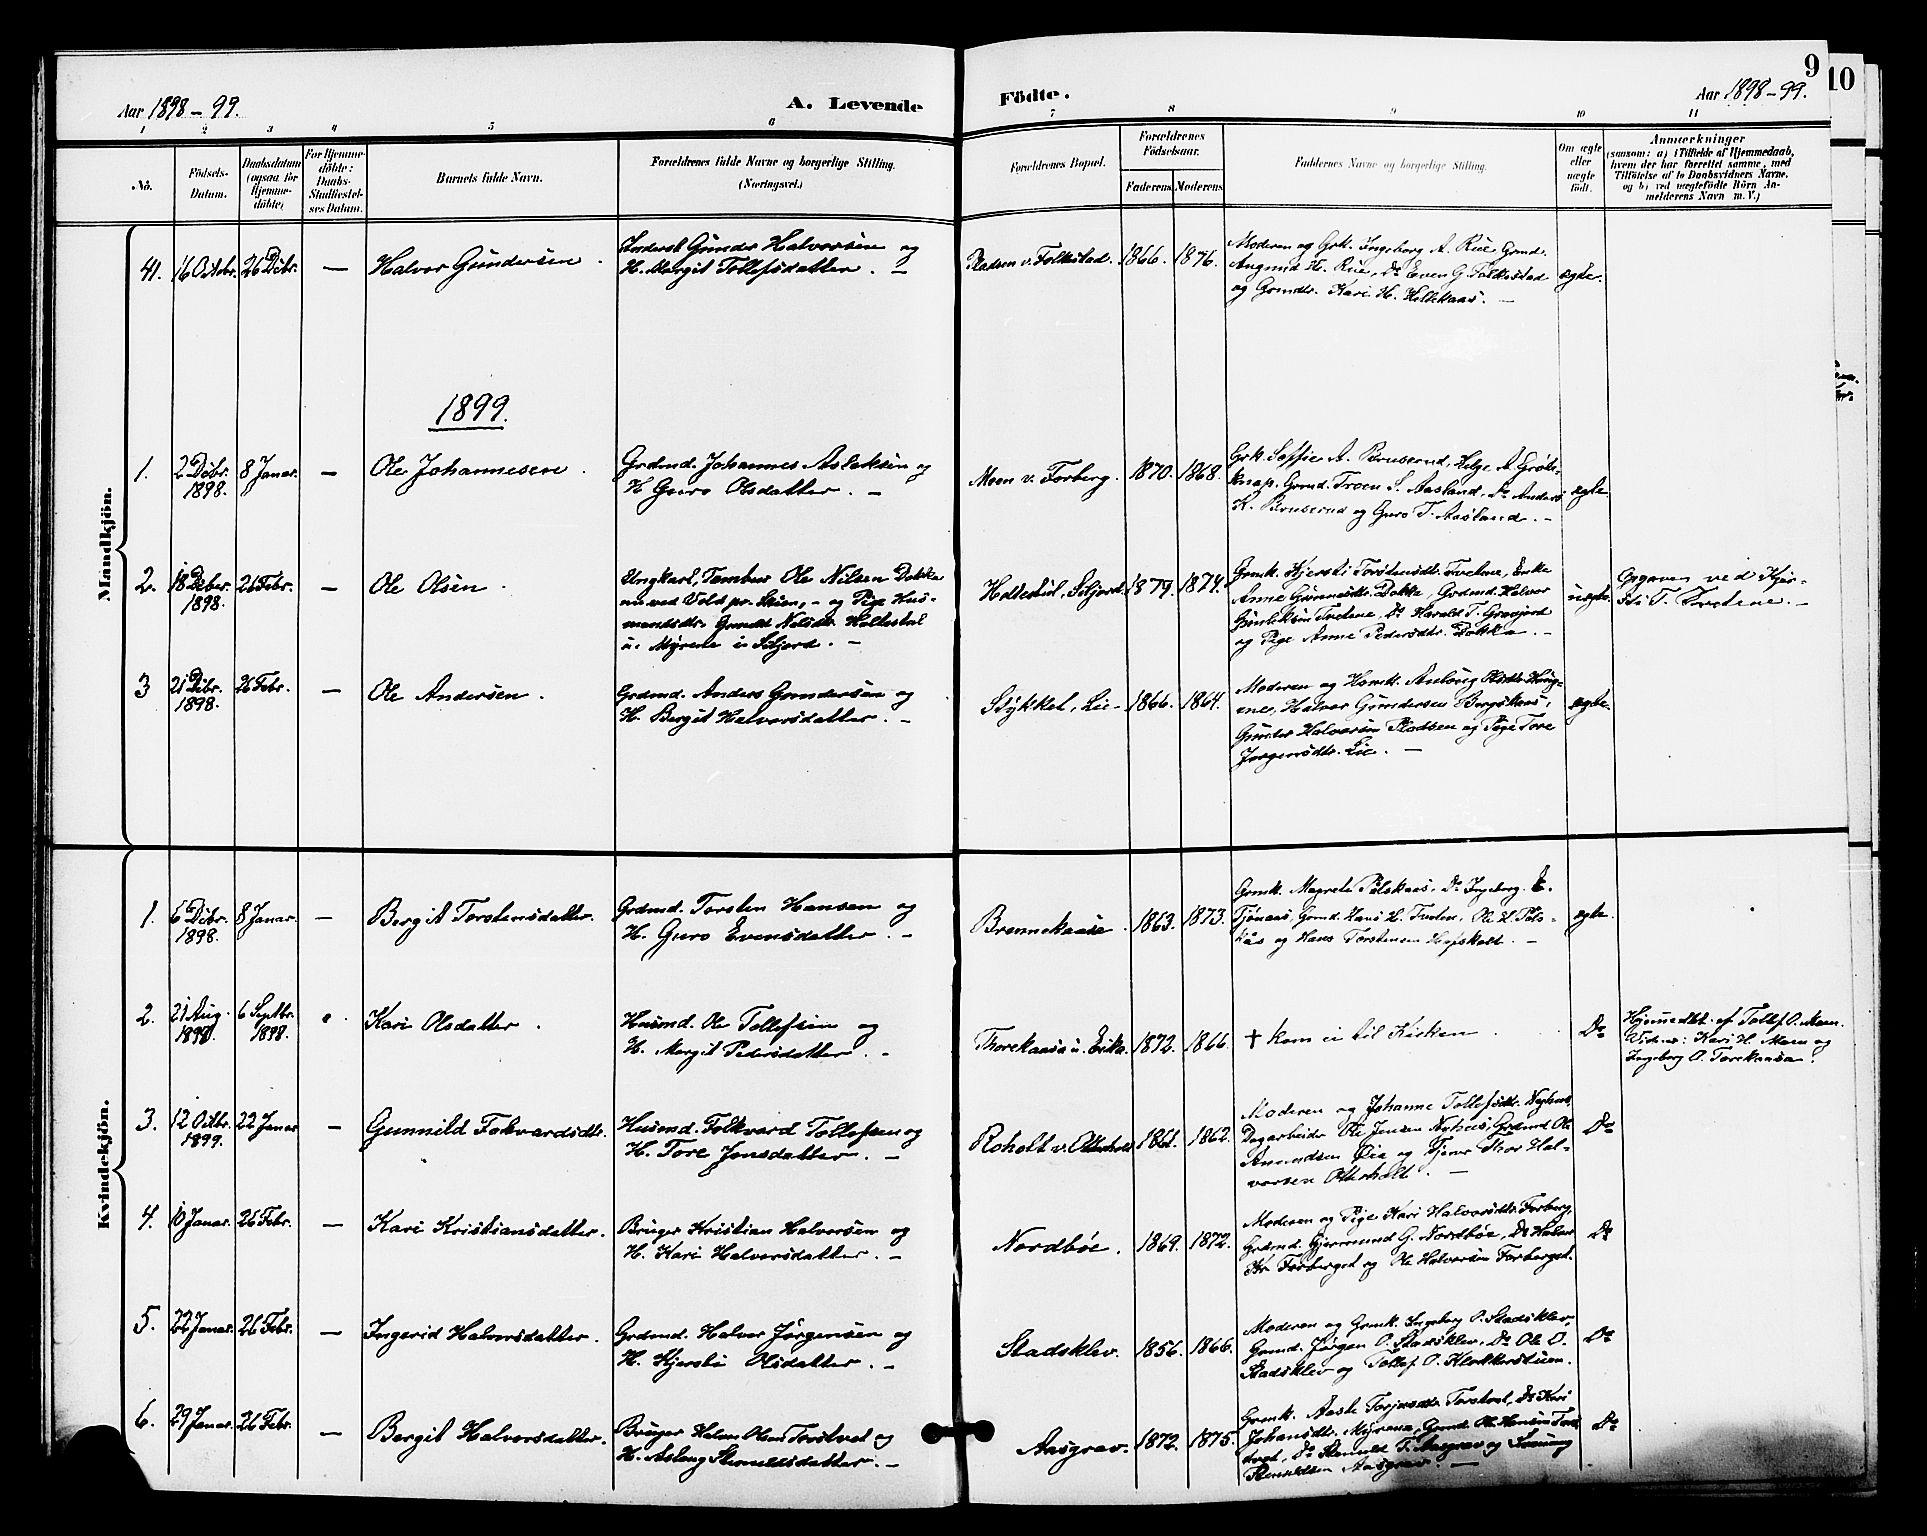 SAKO, Bø kirkebøker, G/Ga/L0006: Klokkerbok nr. 6, 1898-1909, s. 9